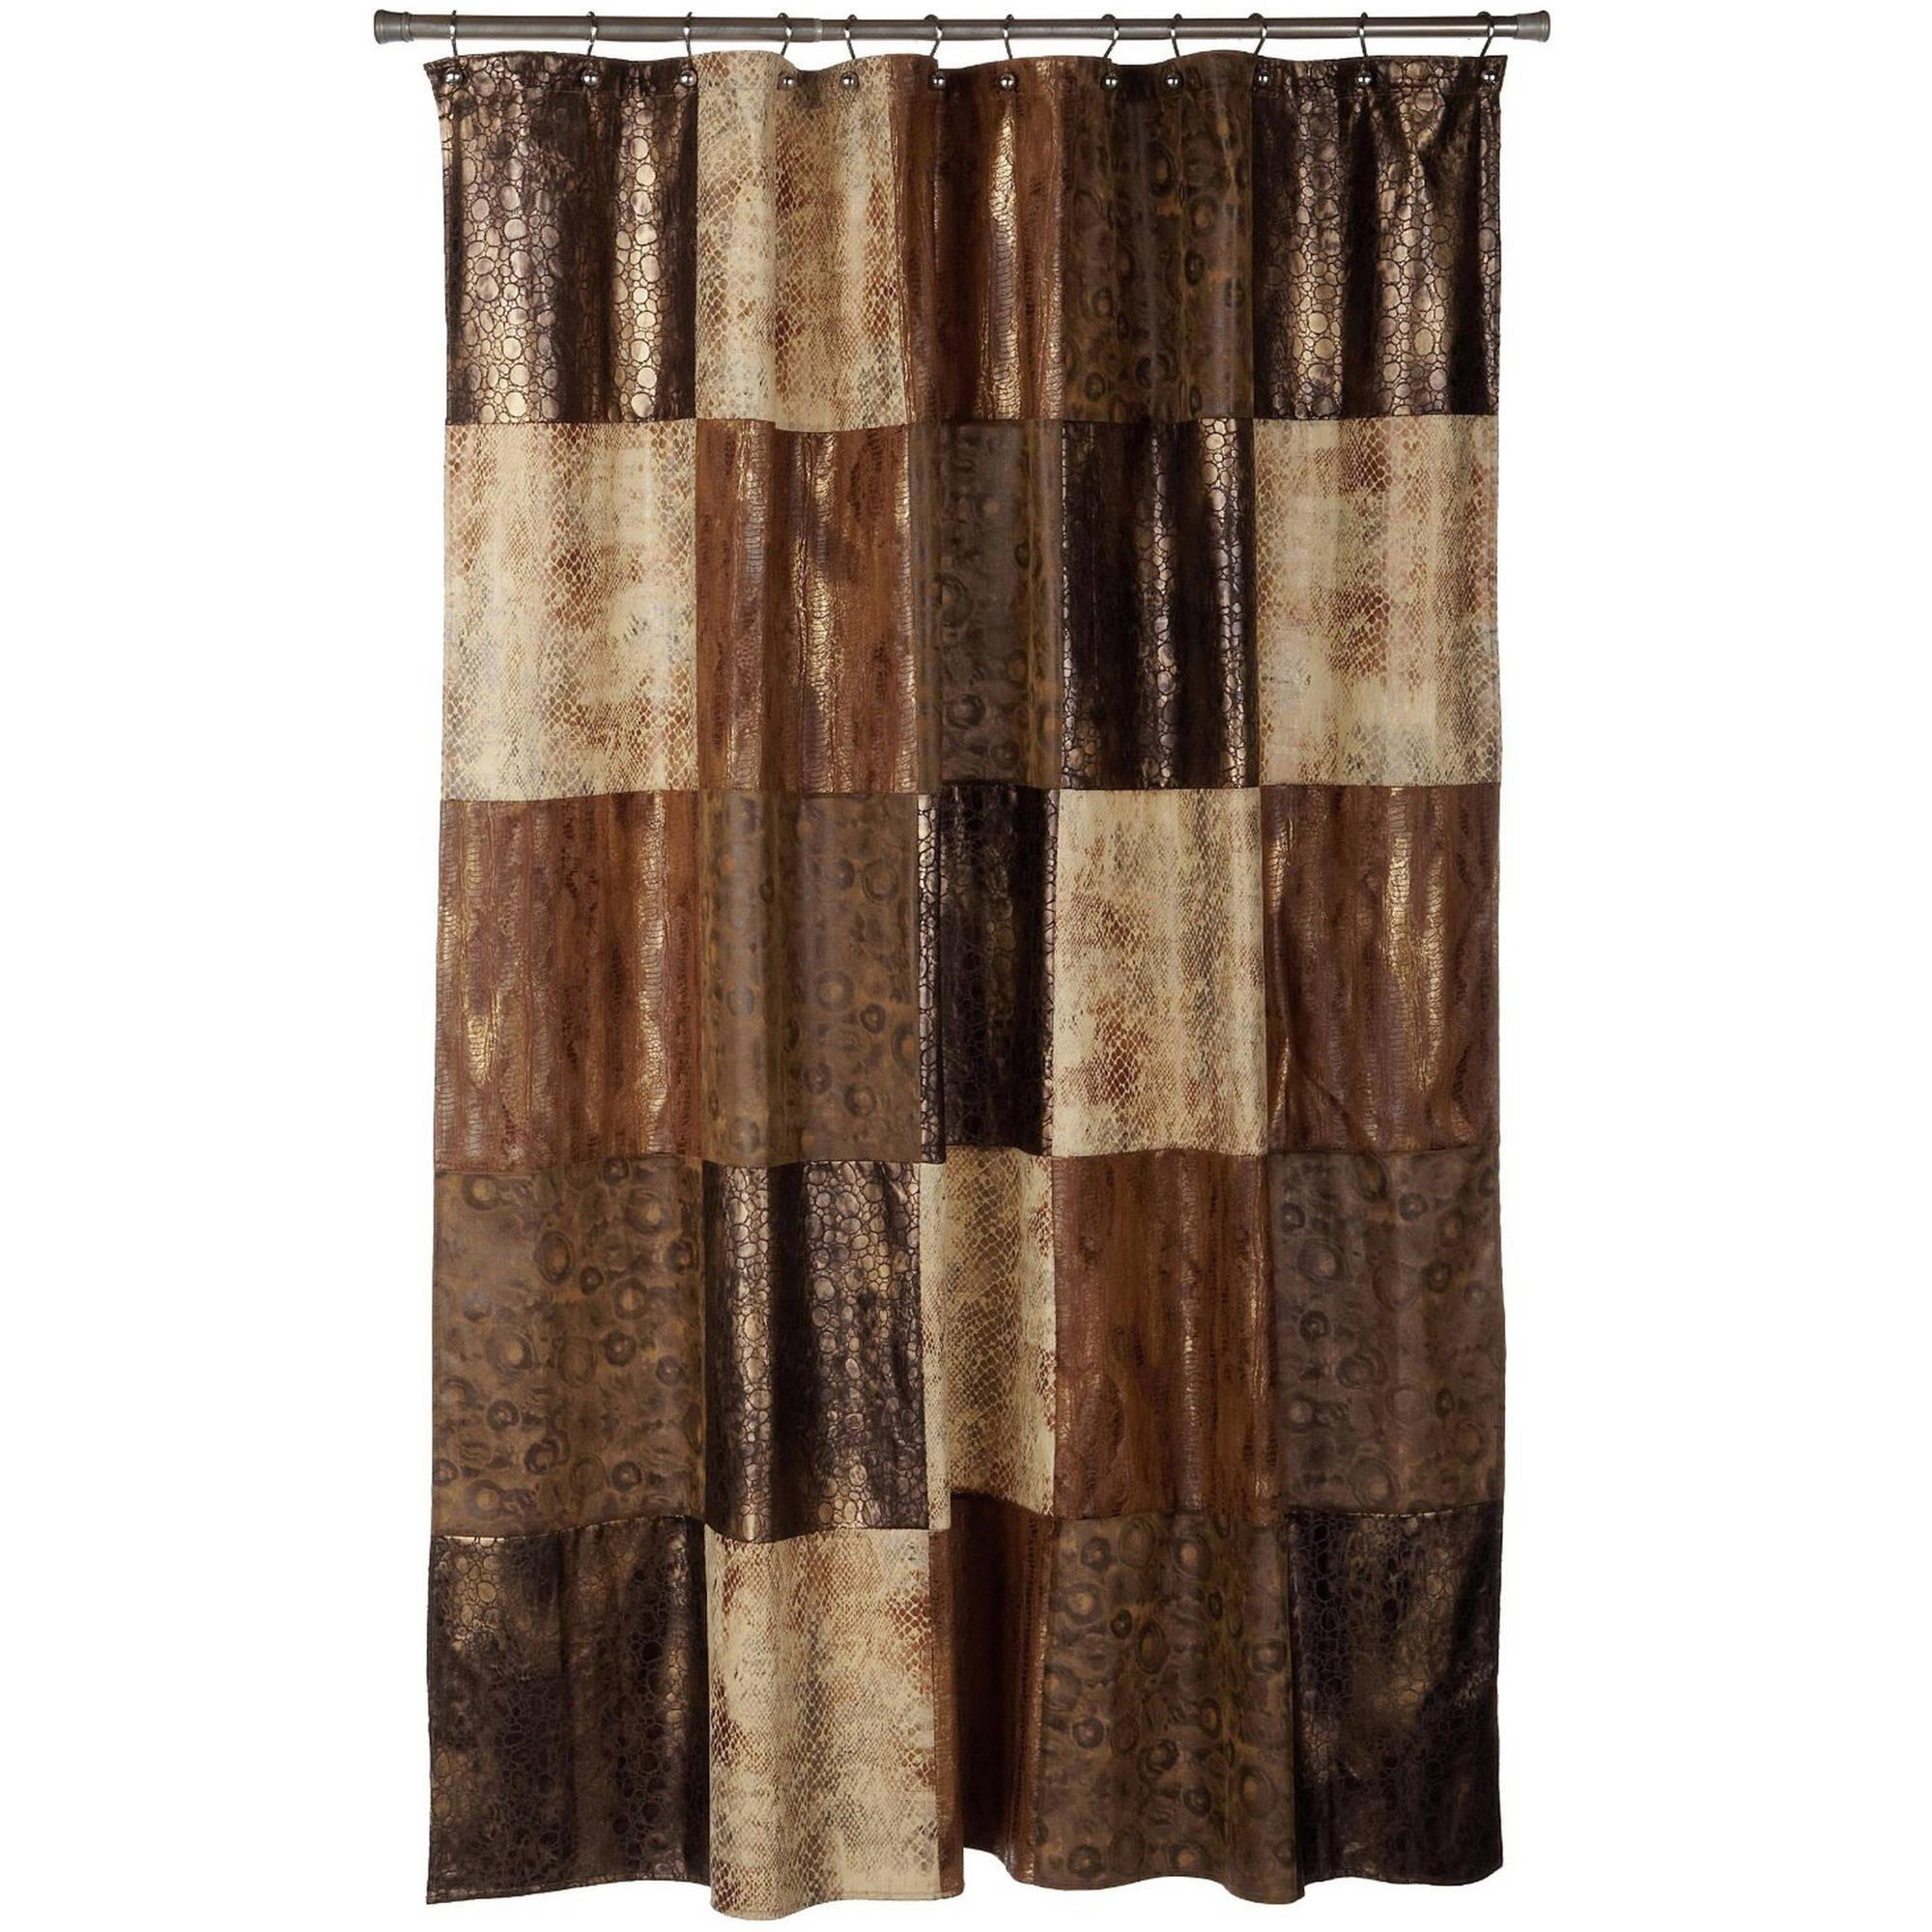 Piece Bath Sets - Burgundy shower curtain sets